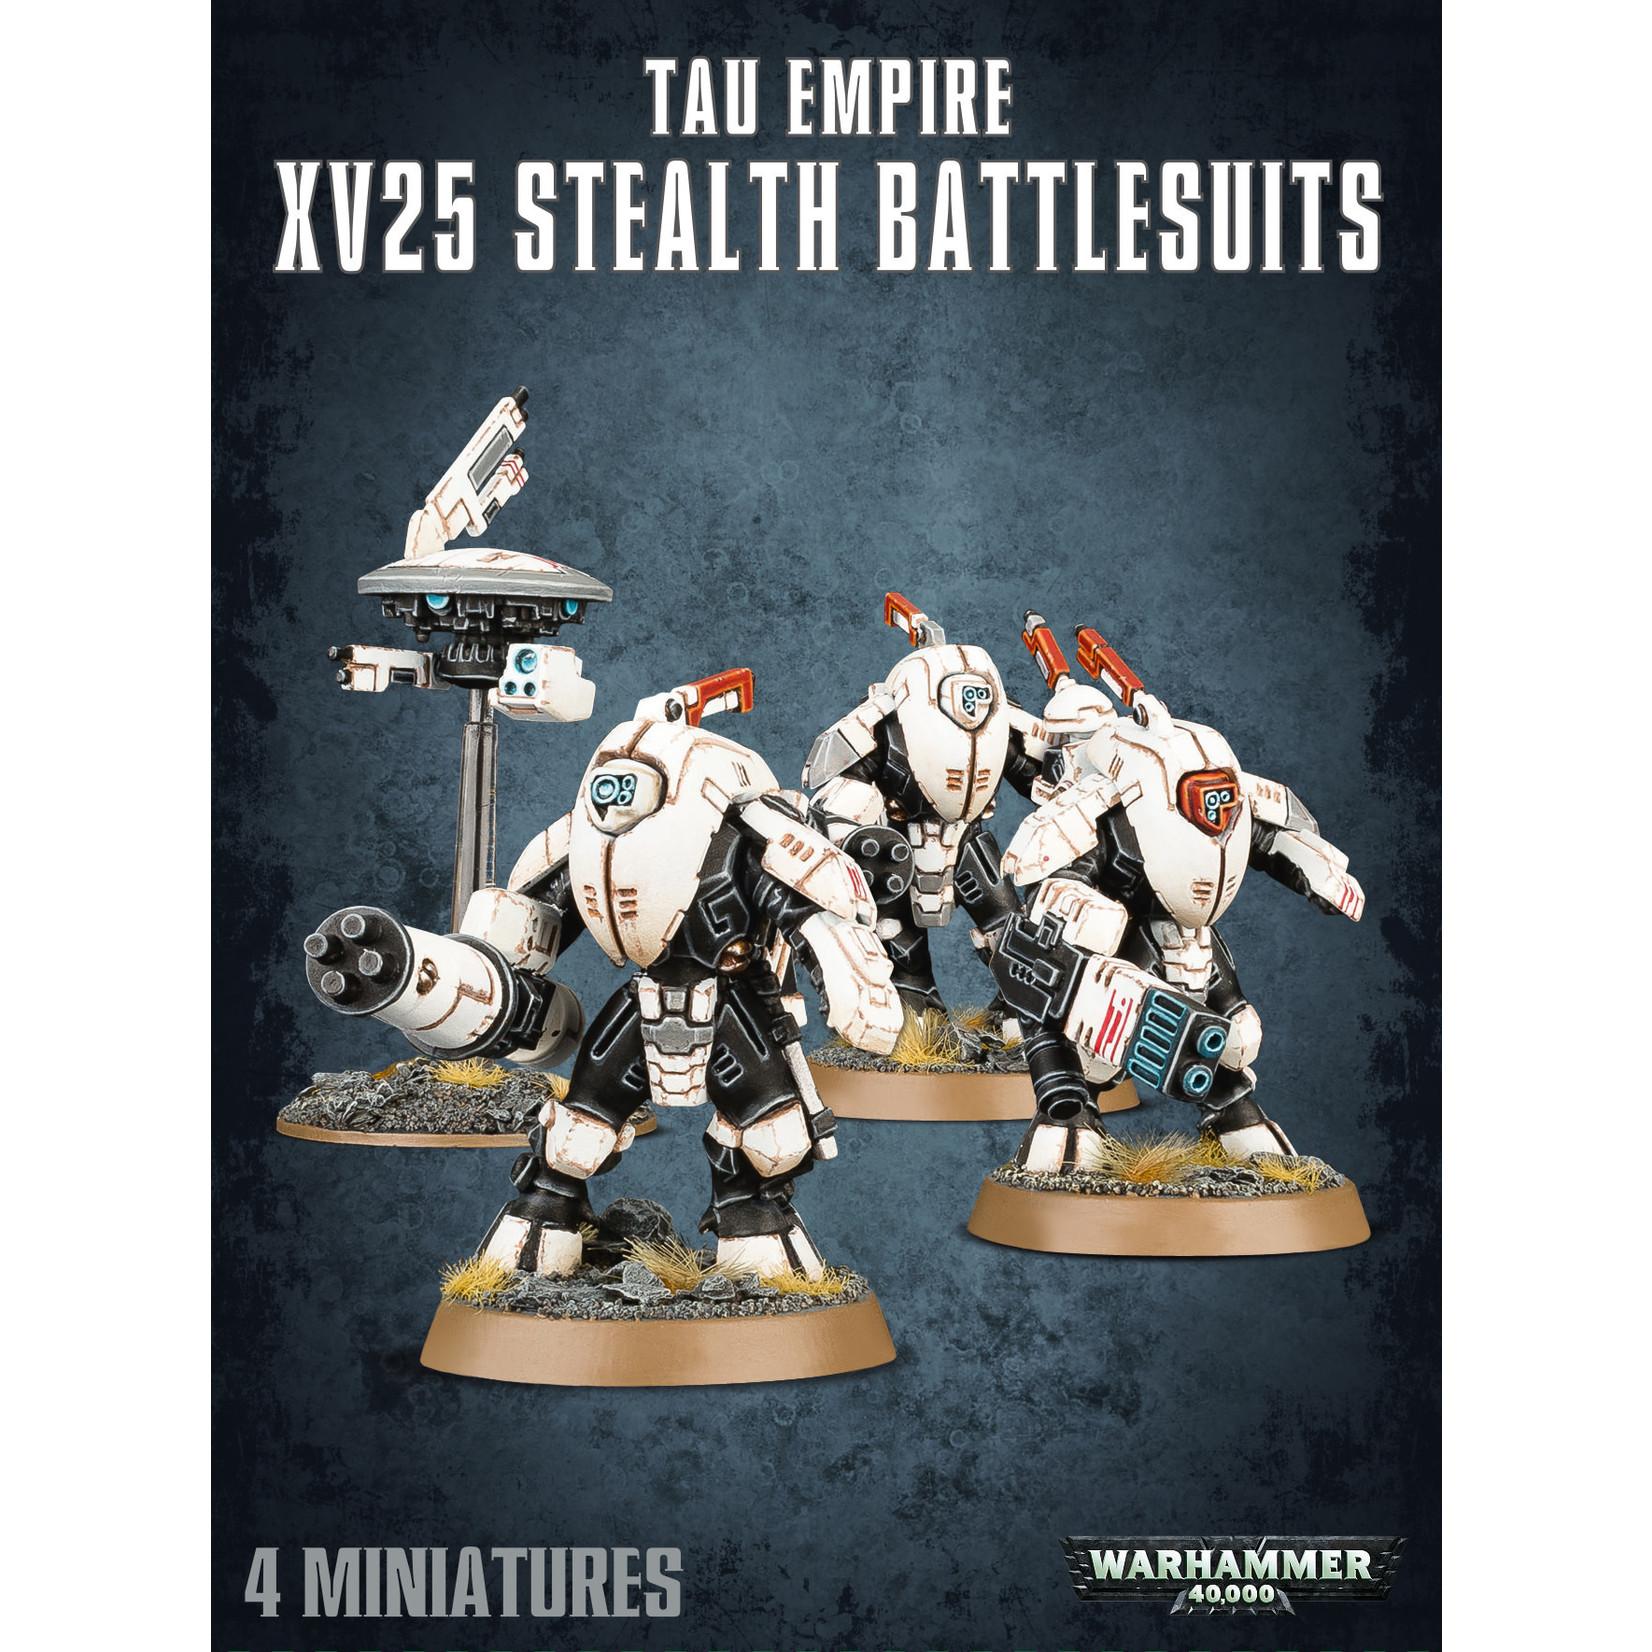 Games Workshop Warhammer 40k: Tau Empire - XV25 Stealth Battlesuits